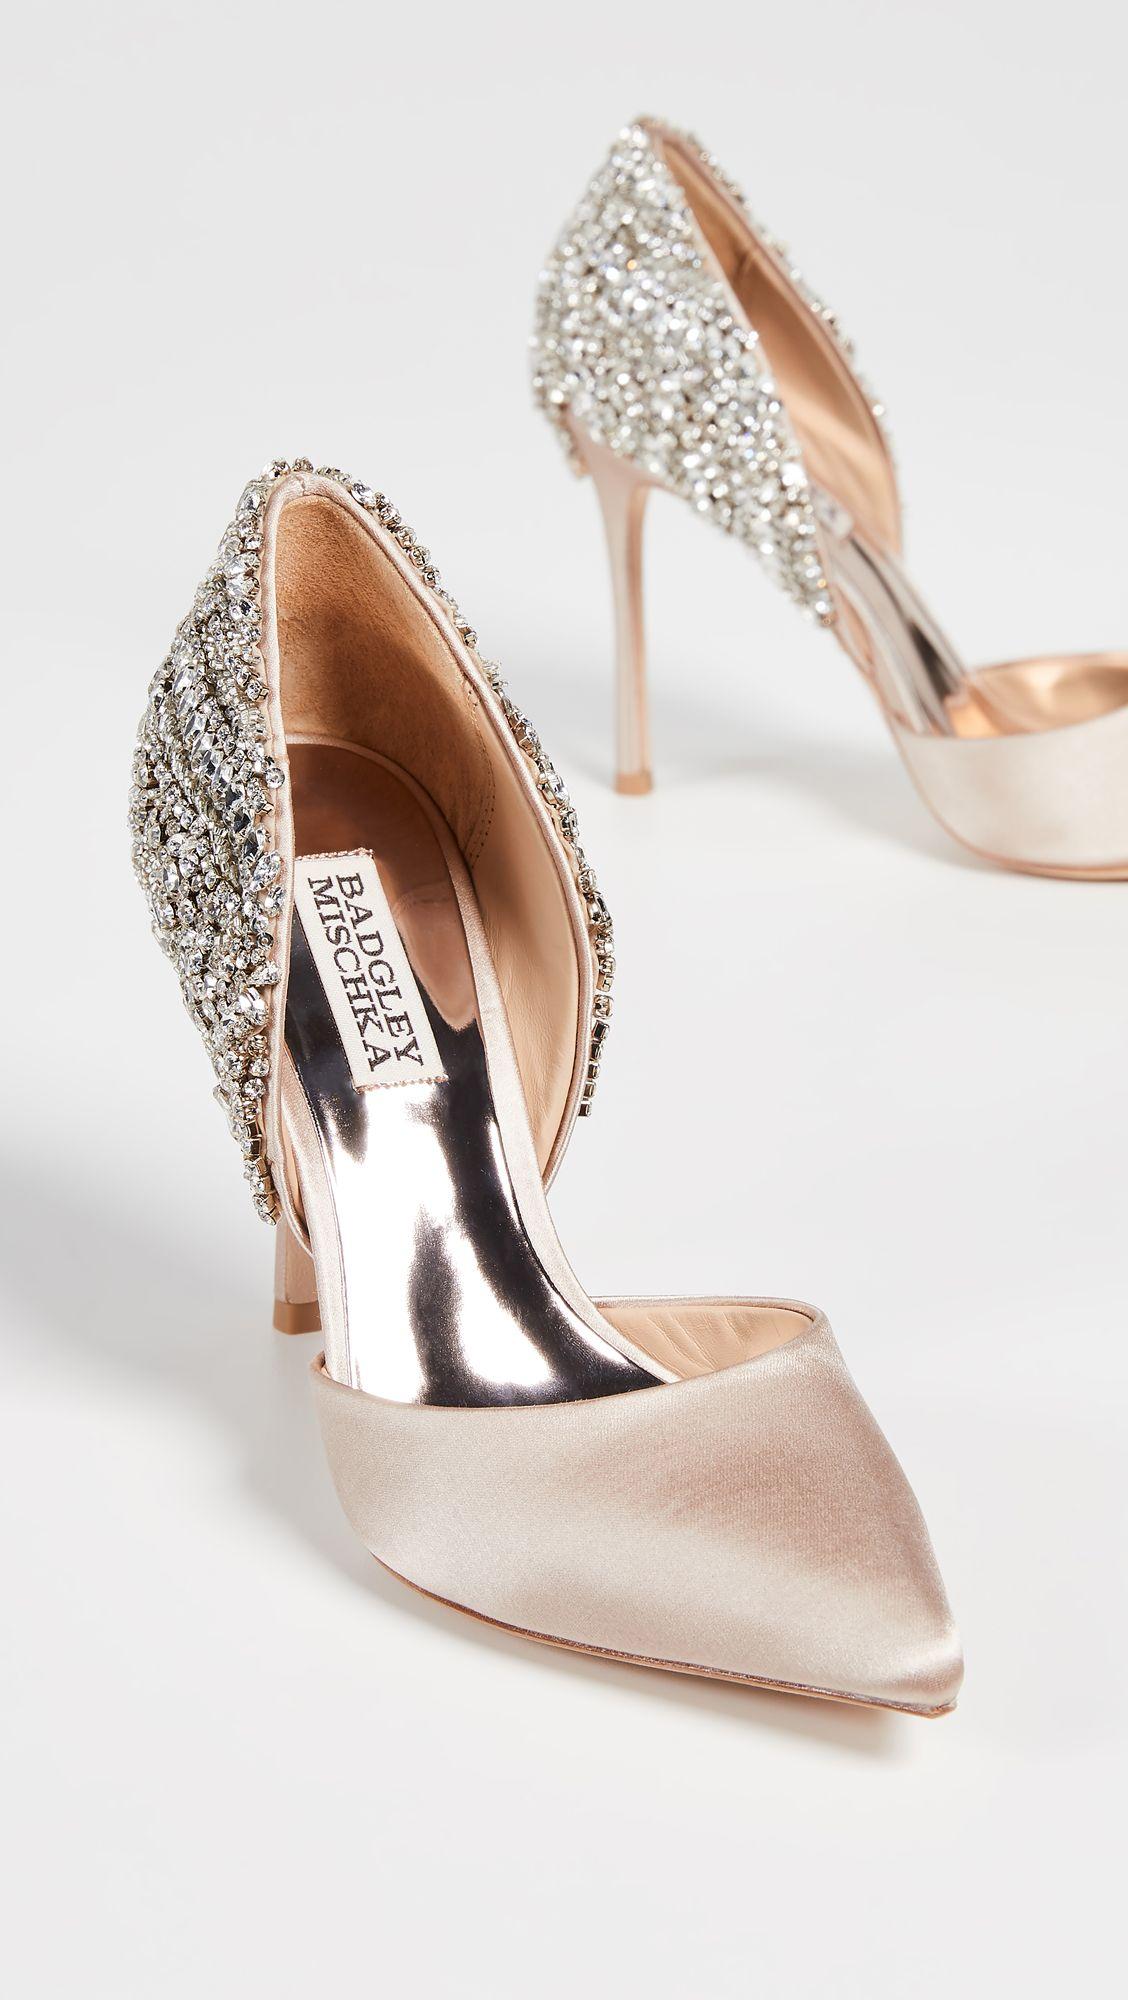 f91cefa9aa Badgley Mischka - Volare Point Toe Pumps | Trendy Dress Shoes in ...